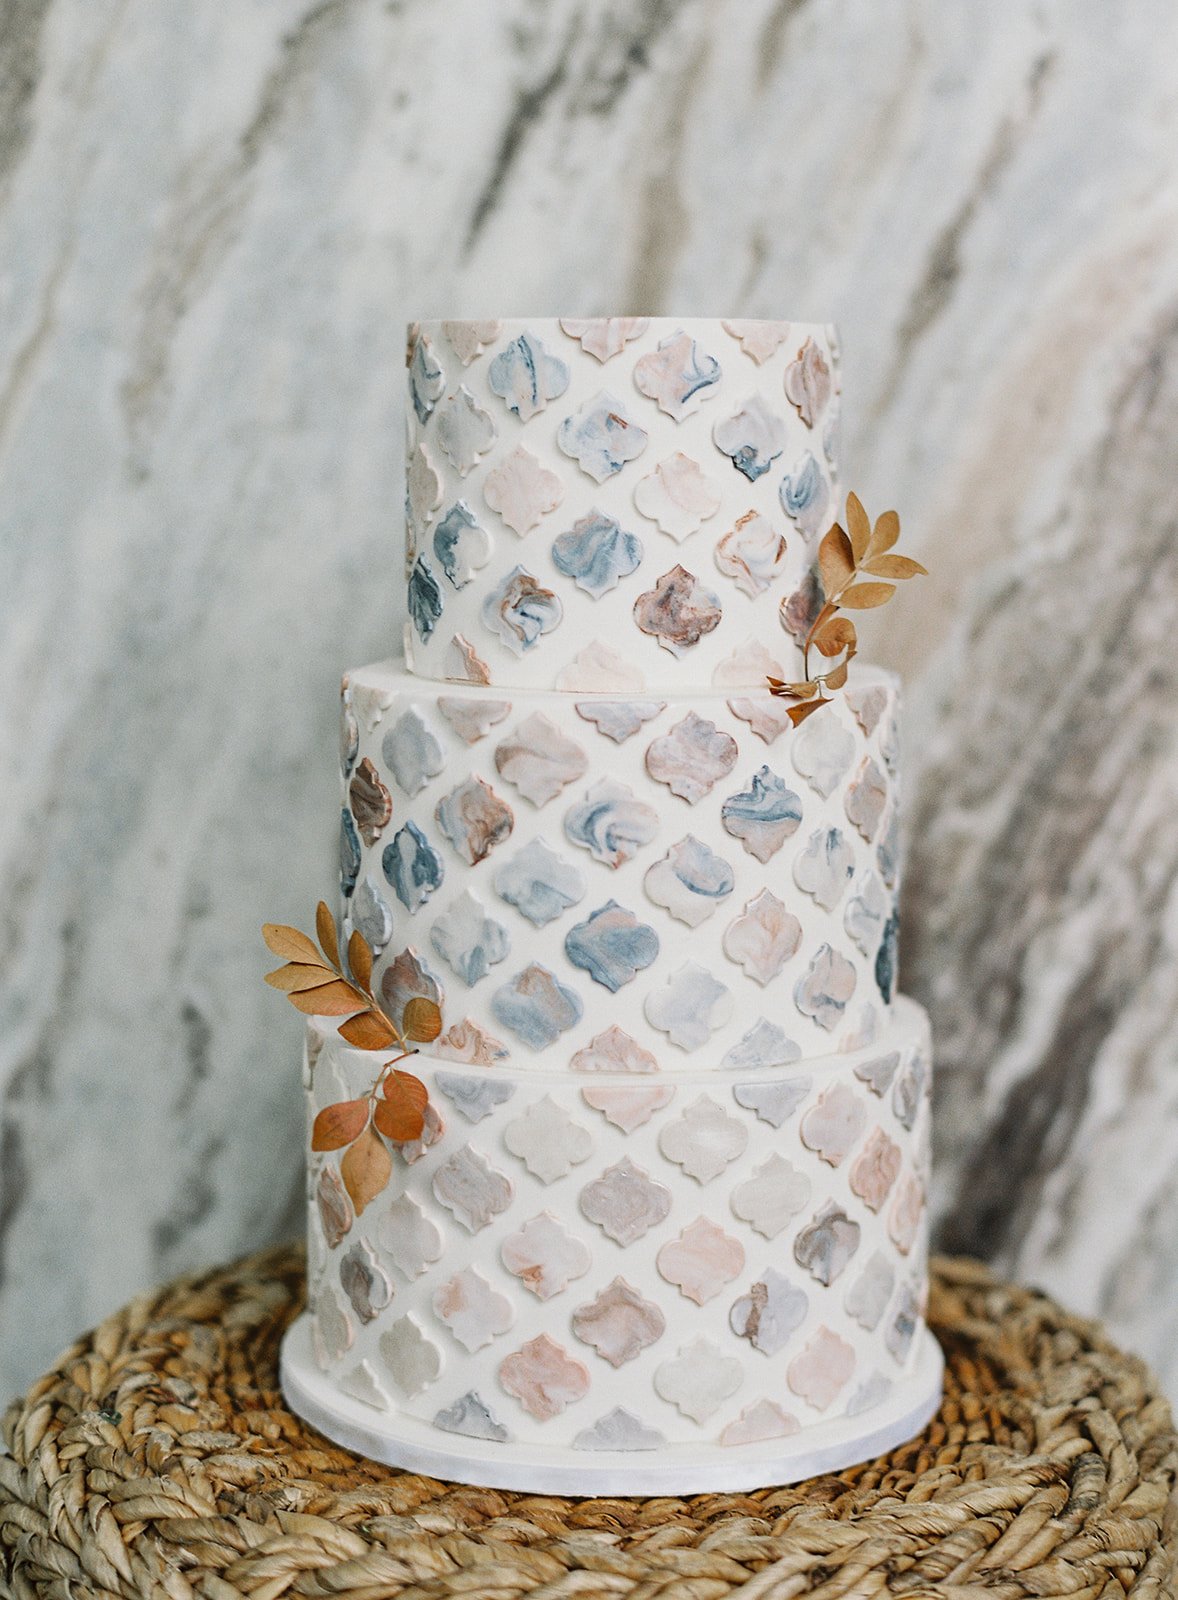 Marble Cake Design